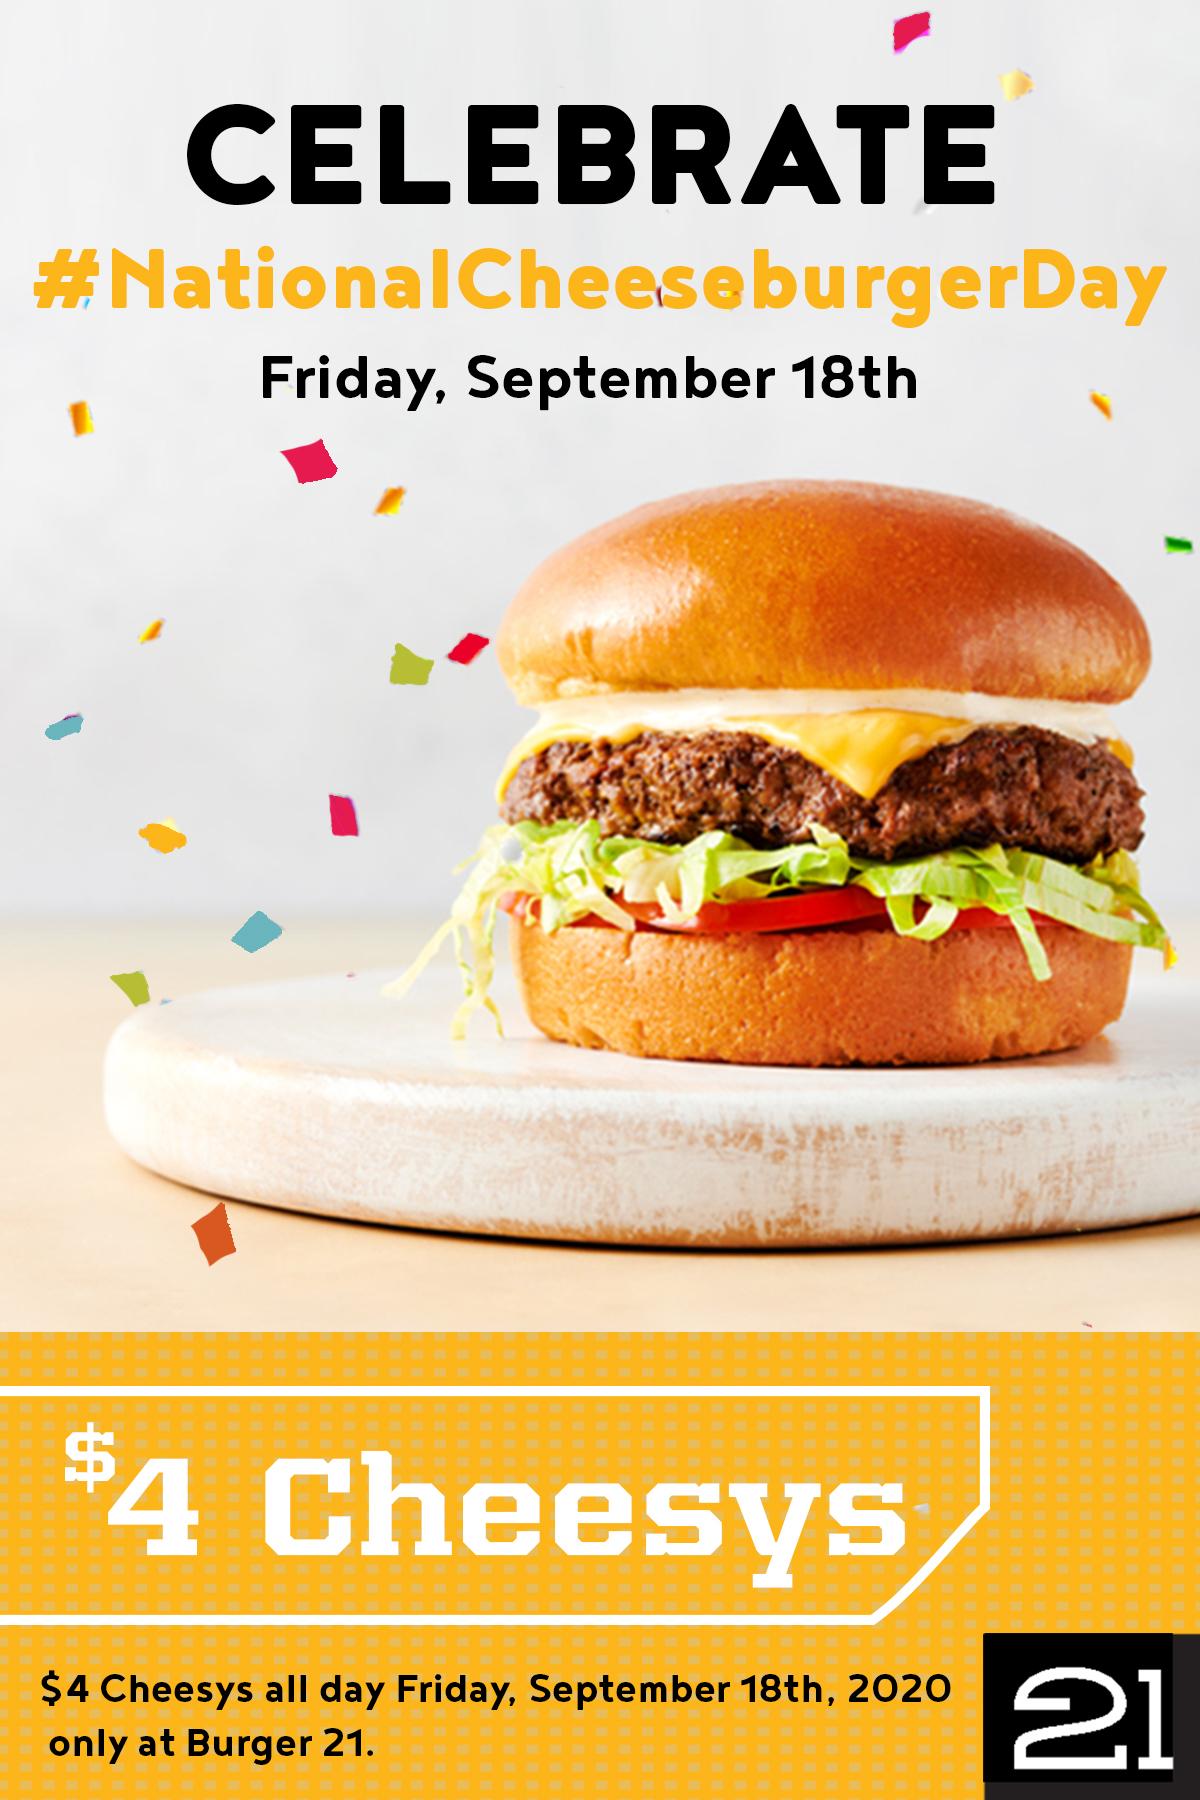 National Cheeseburger Day Burger 21 Burgers Reinvented